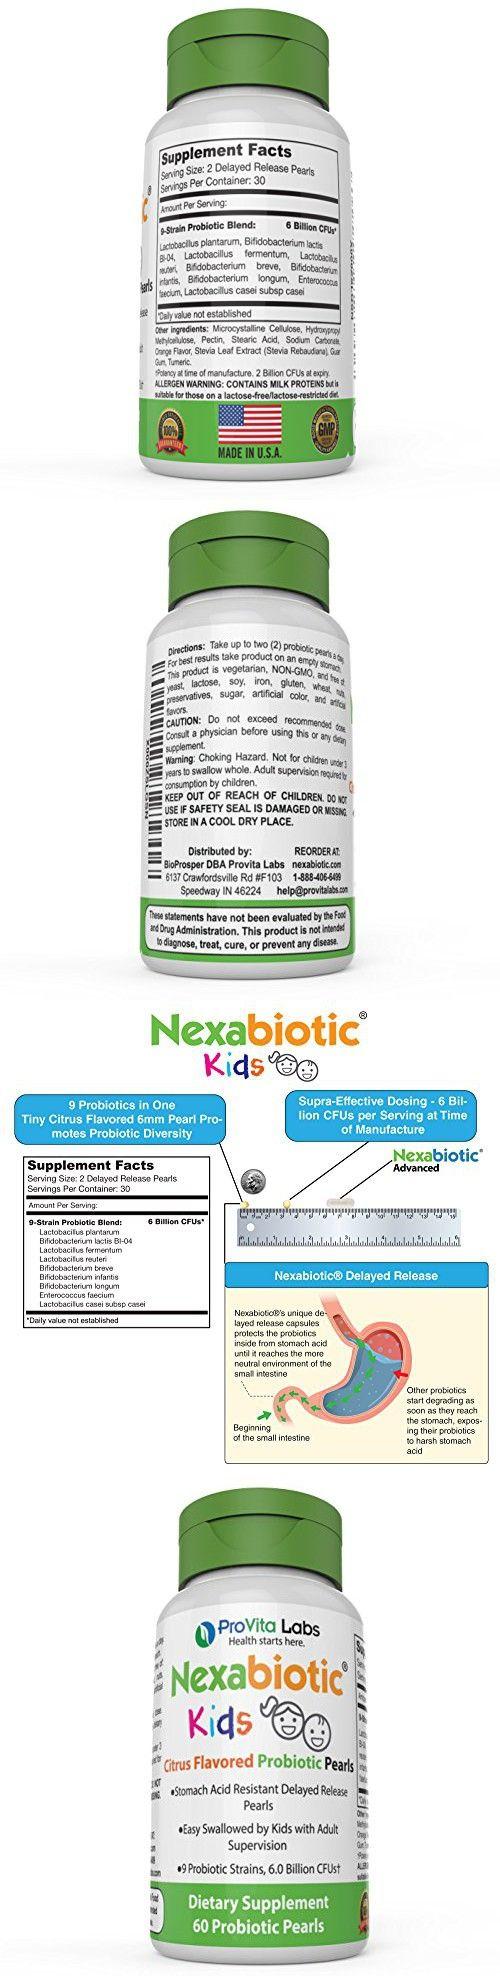 Nexabiotic Kids Chewable Probiotics for Kids in Easy-to-swallow Probiotic Pearls with 9 Strains including Bifidobacterium infantis